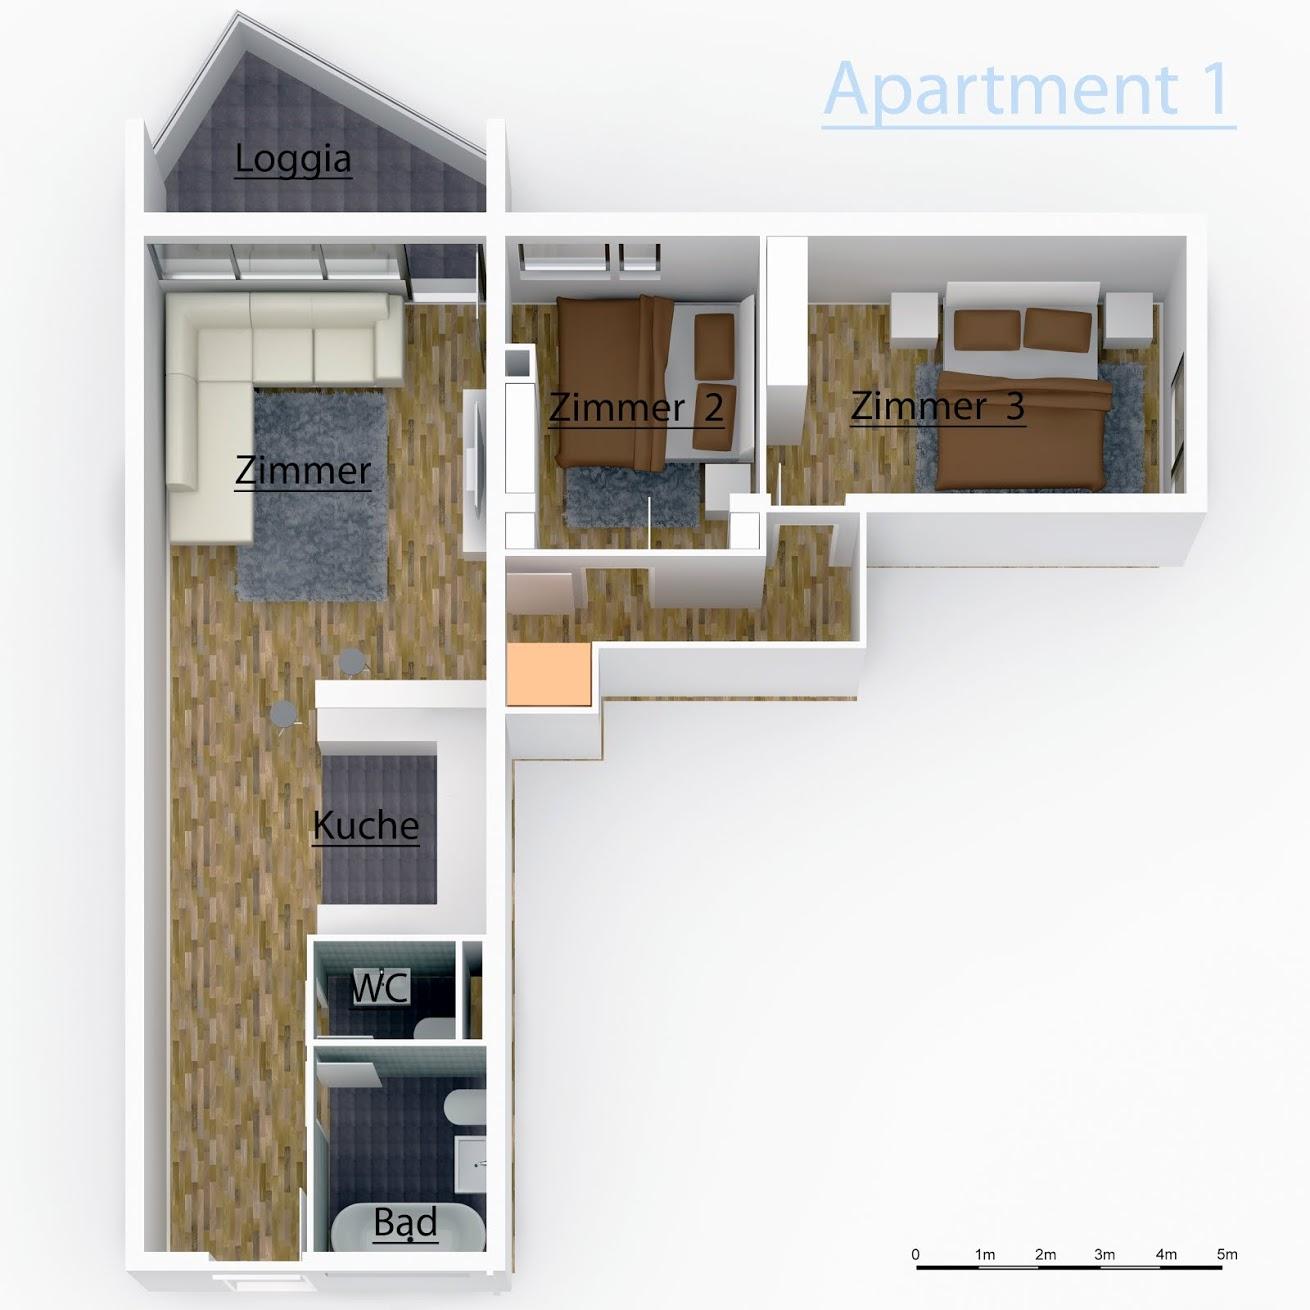 apartment 1 3d floor plan-1.jpg